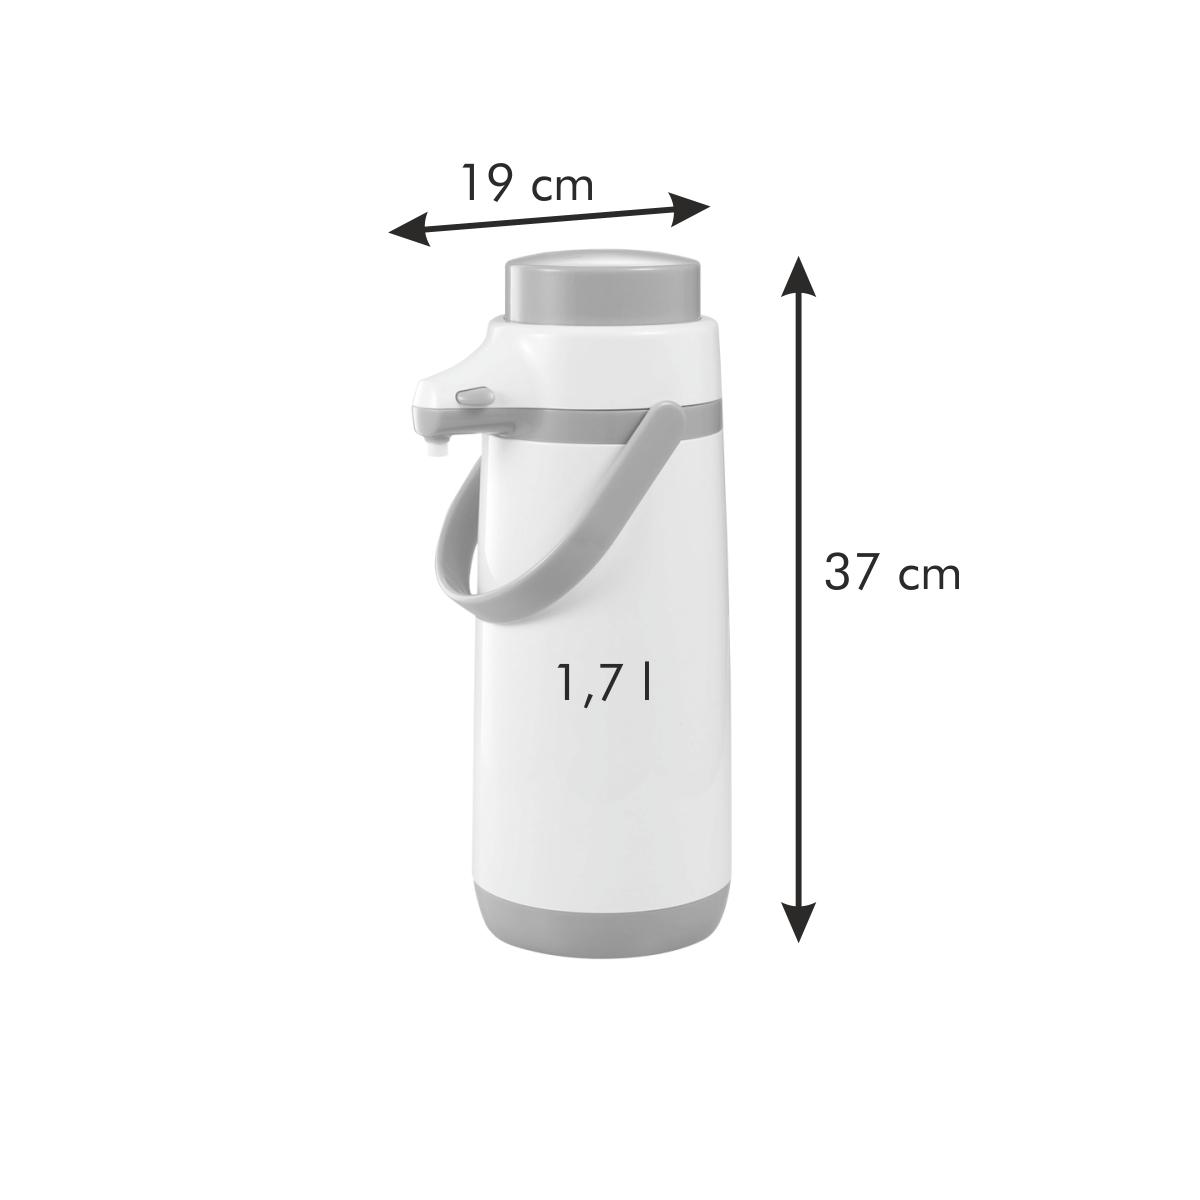 Termoska s pumpičkou FAMILY COLORI 1.7 l